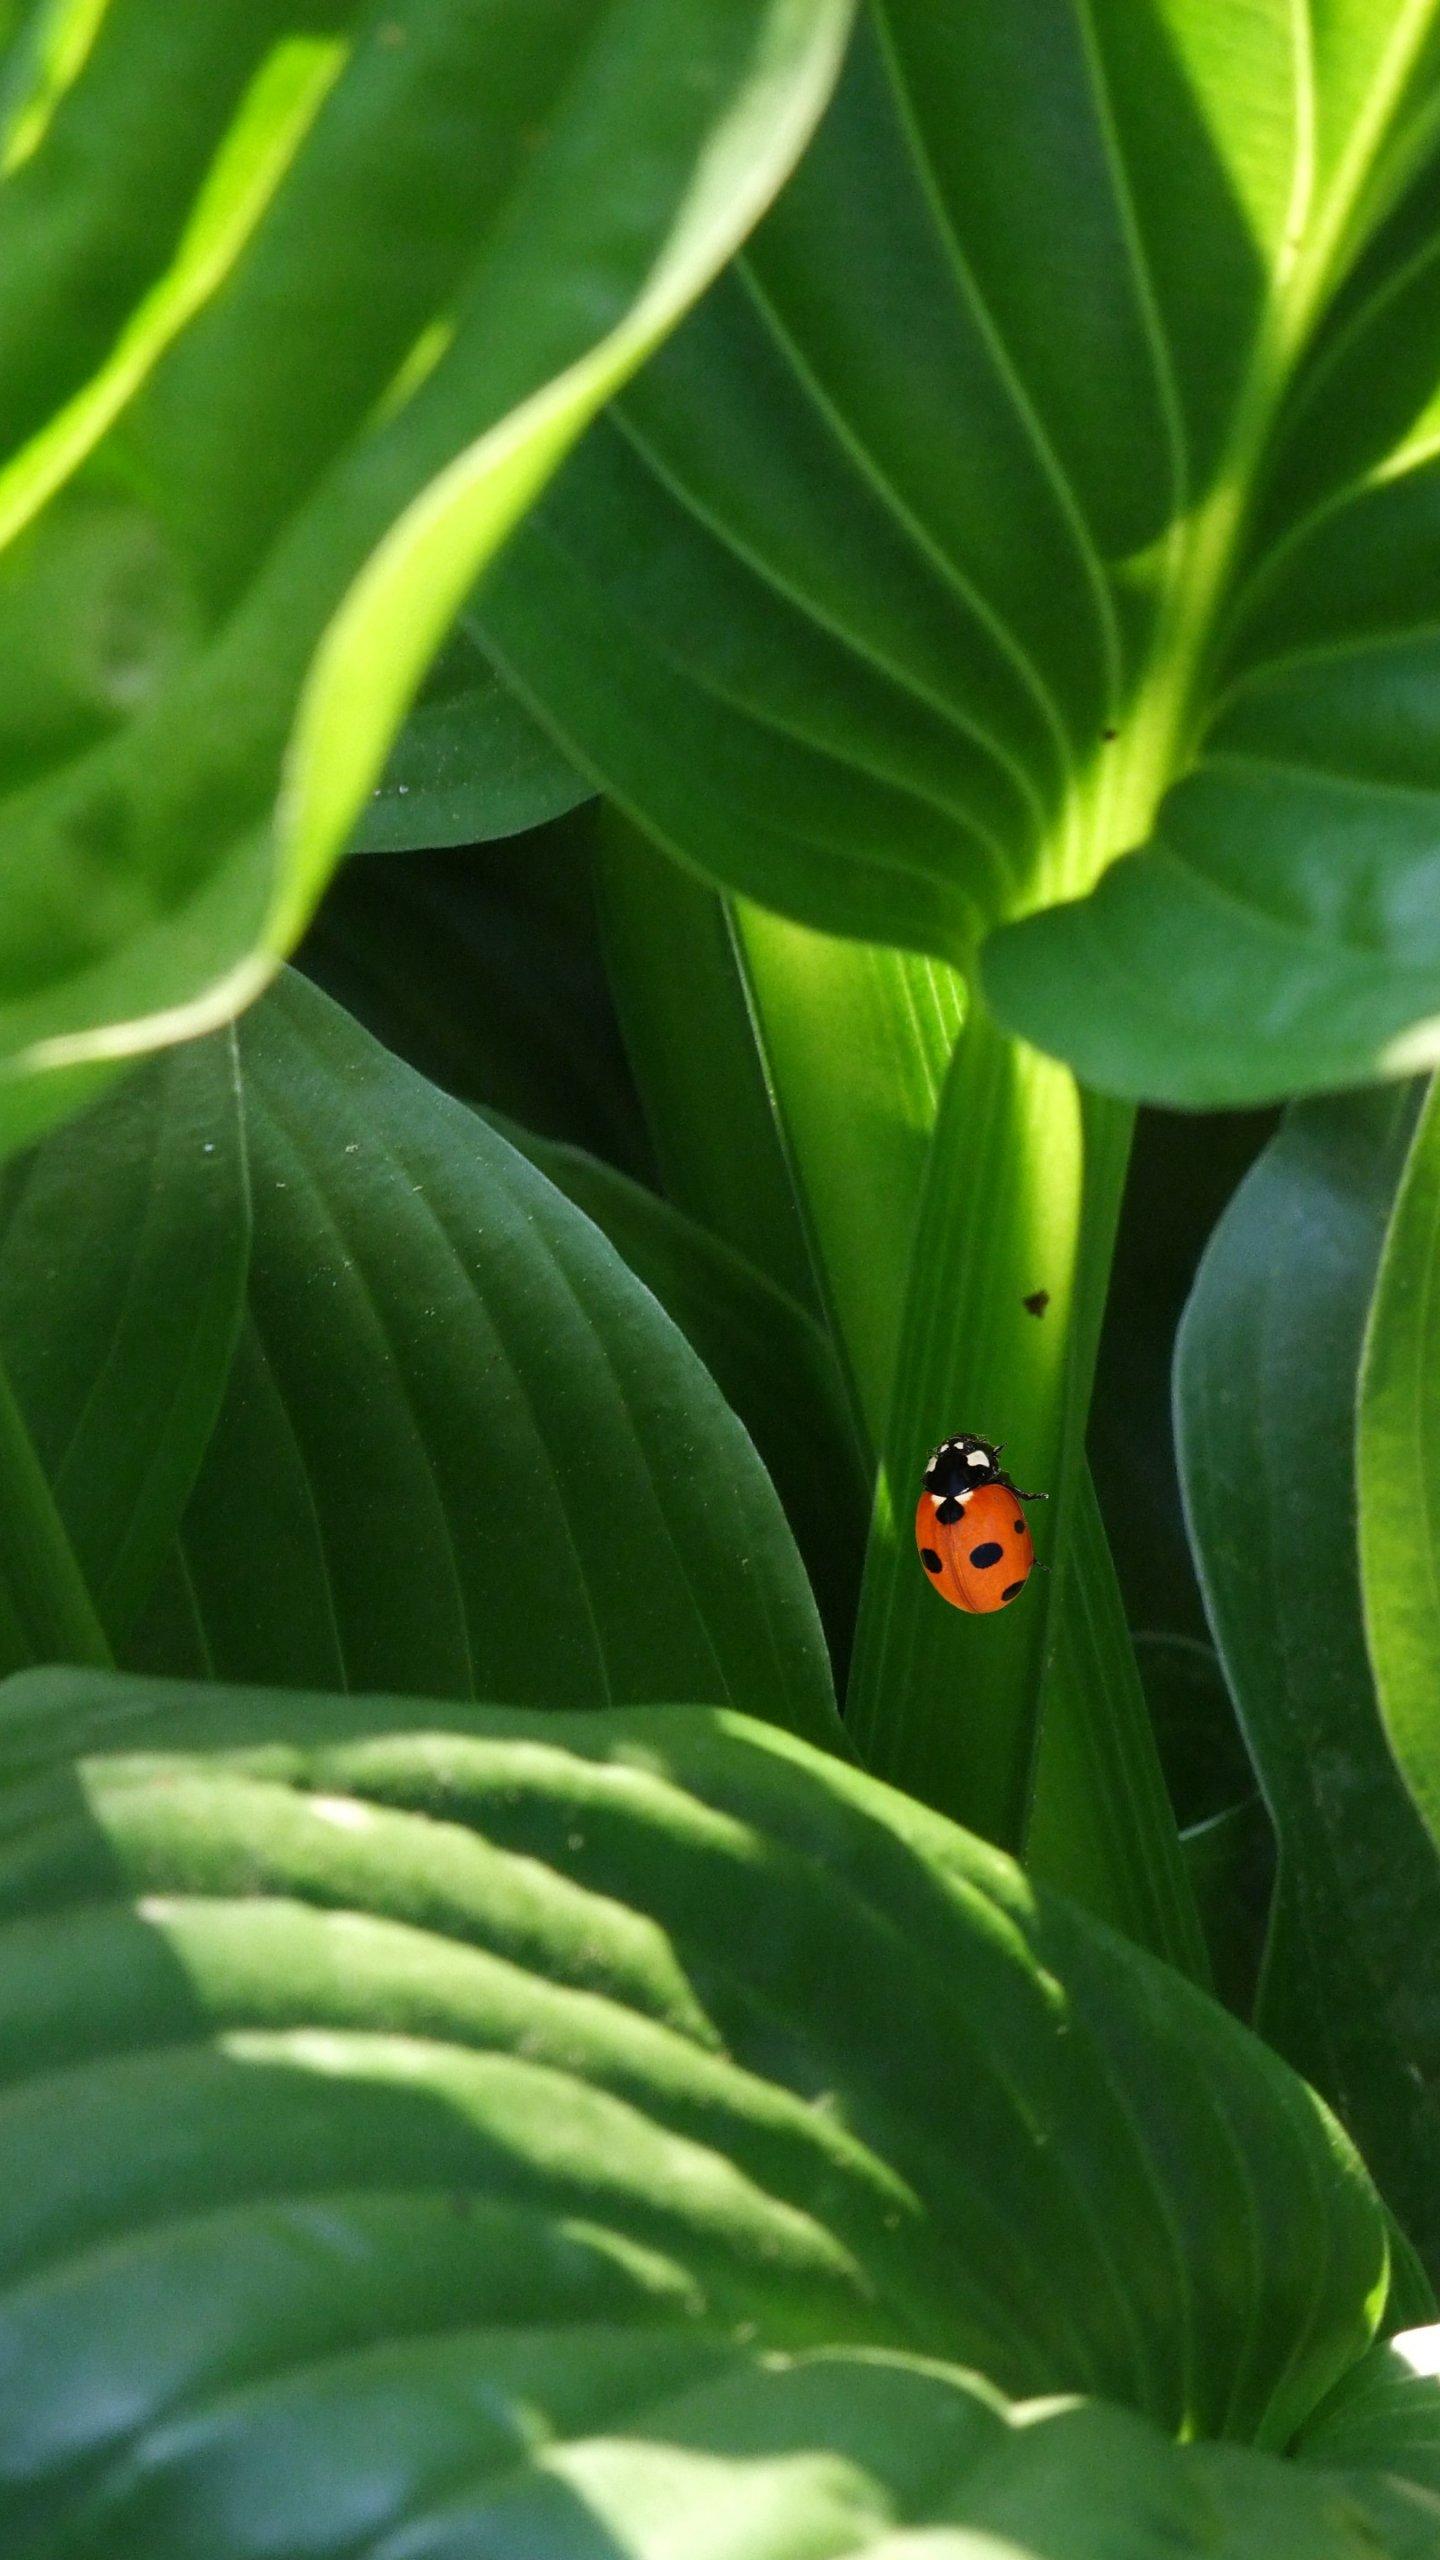 ladybug on leaves wallpaper - iphone, android & desktop backgrounds